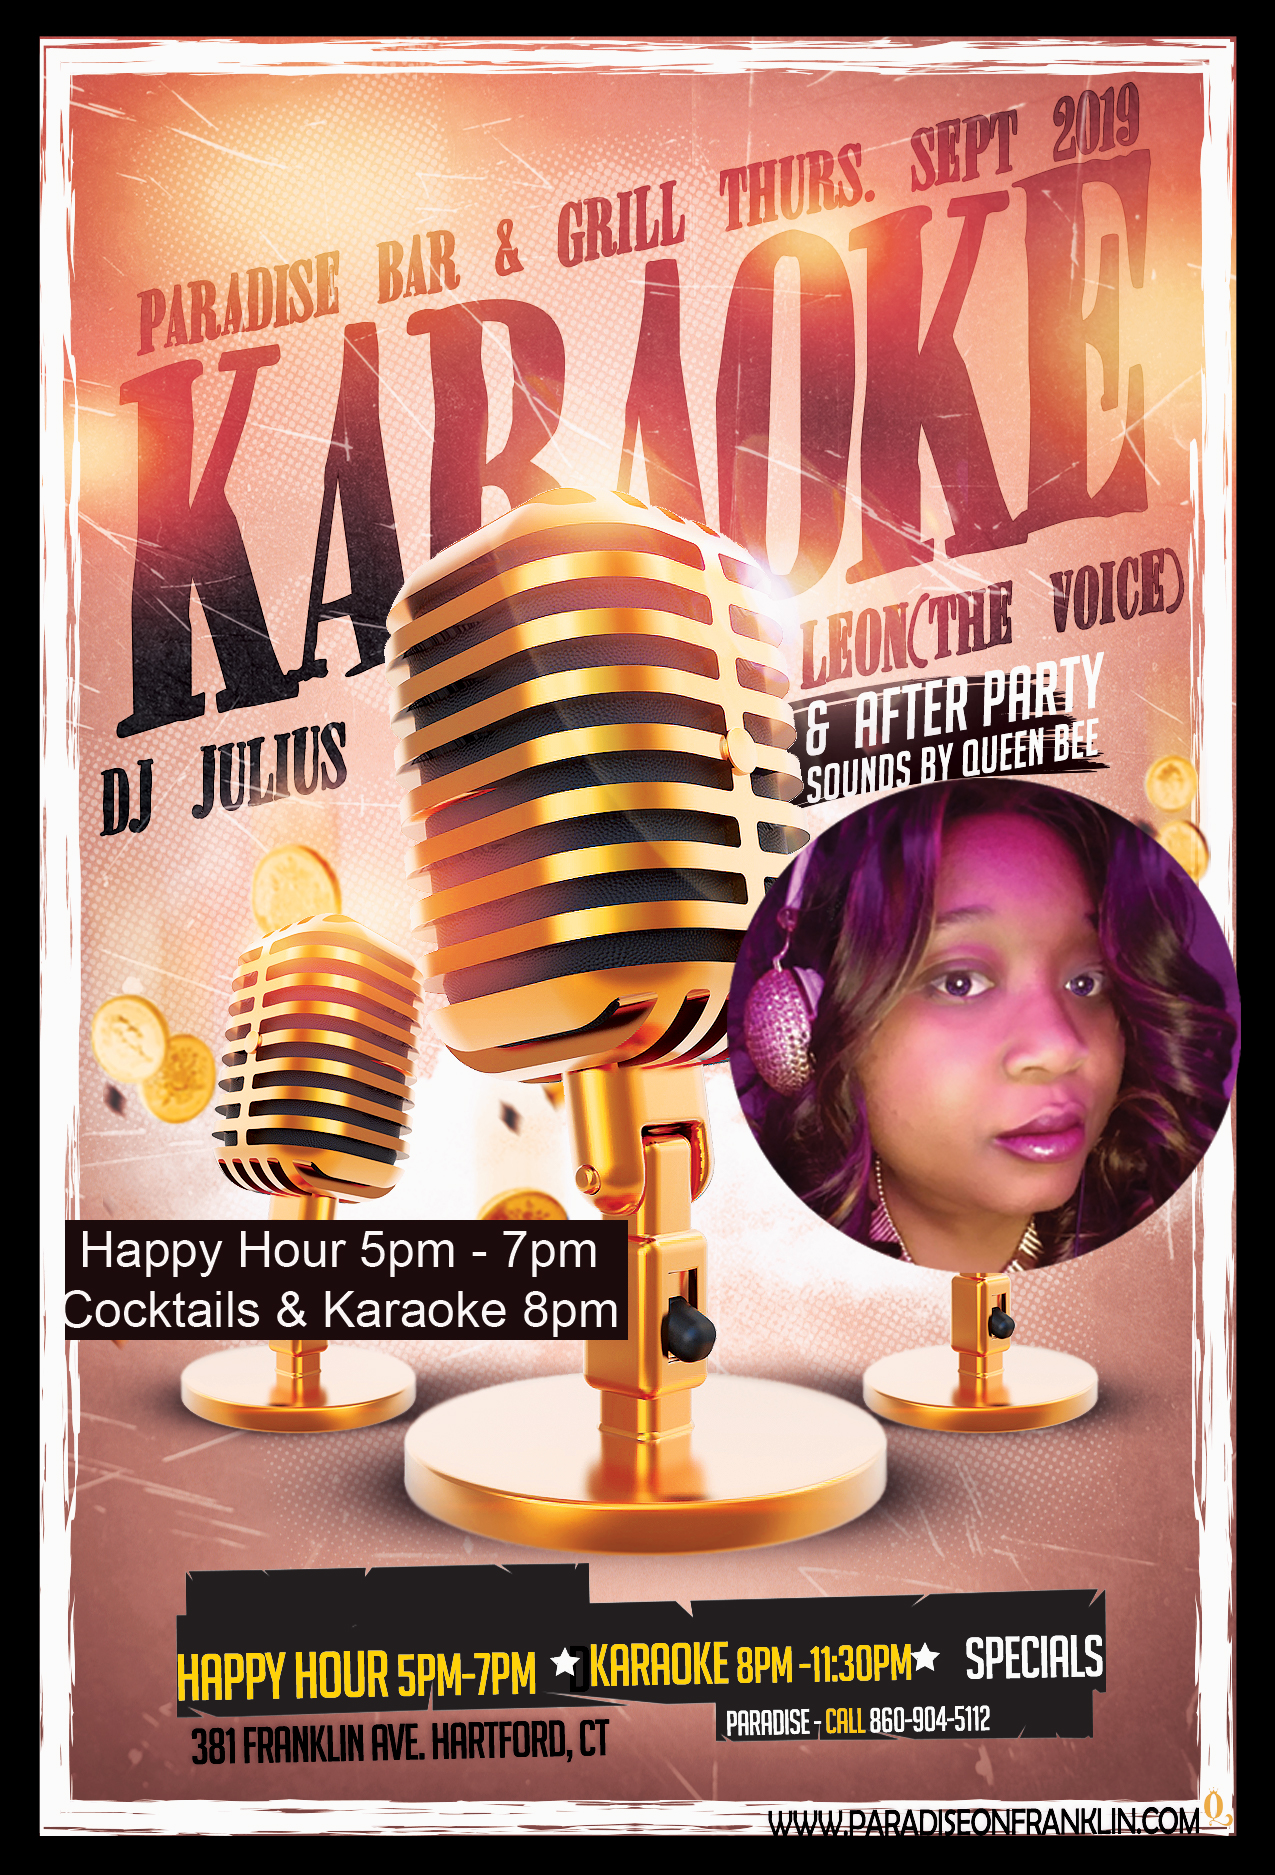 karaokecoseot.jpg